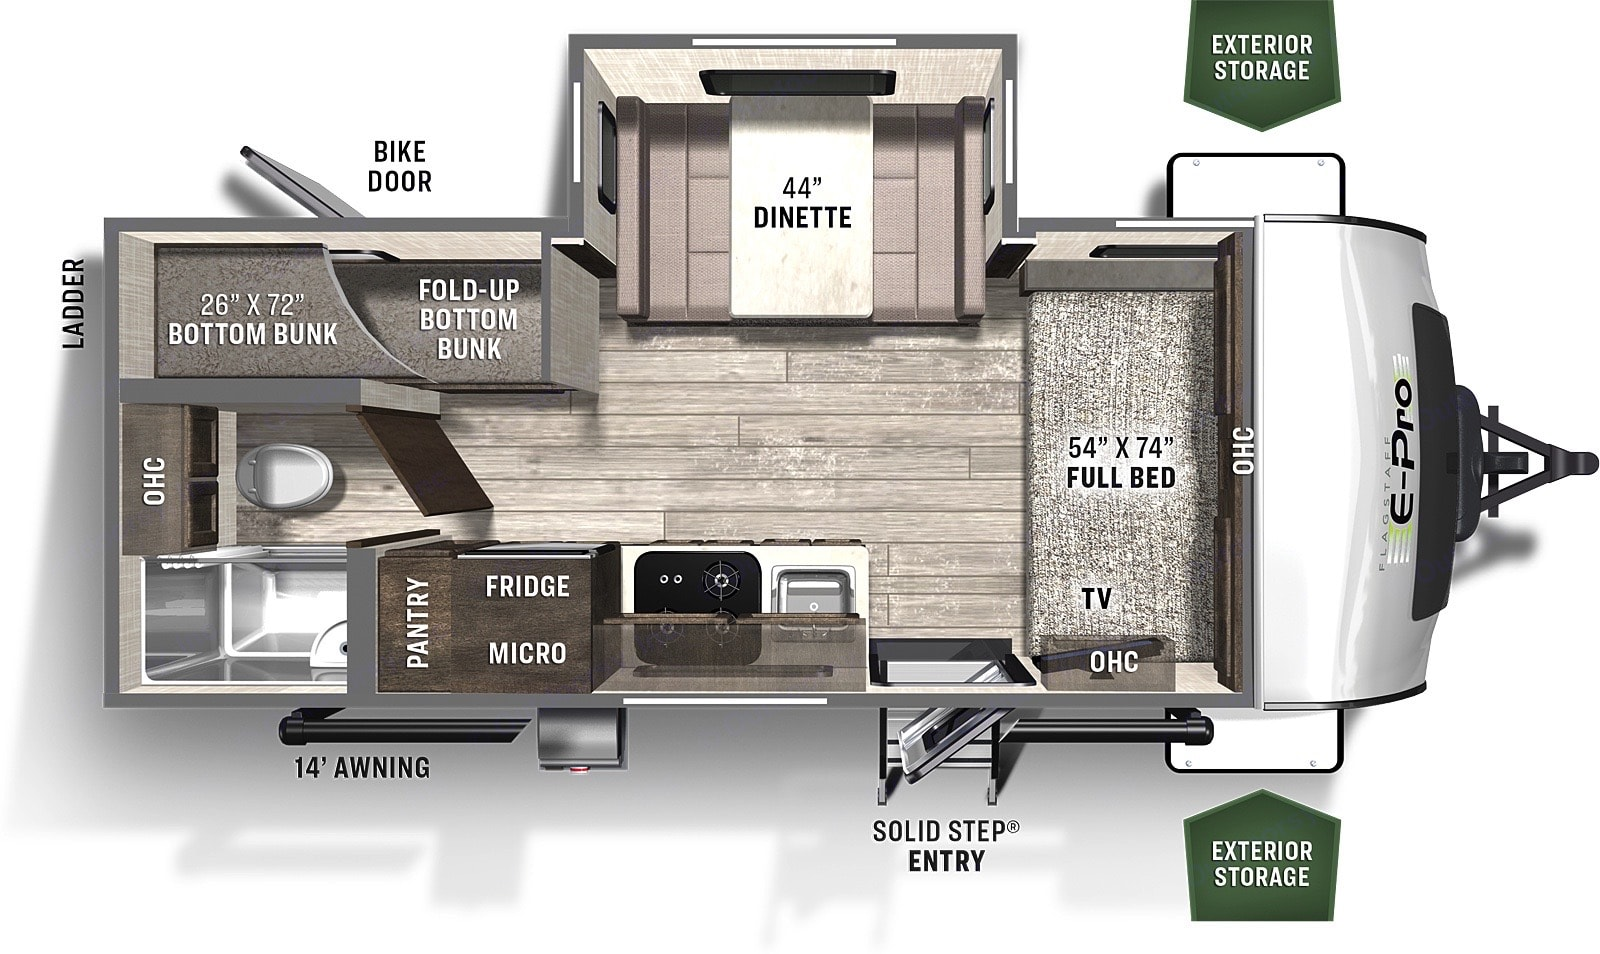 Flagstaff E-Pro 20 BHS 2021